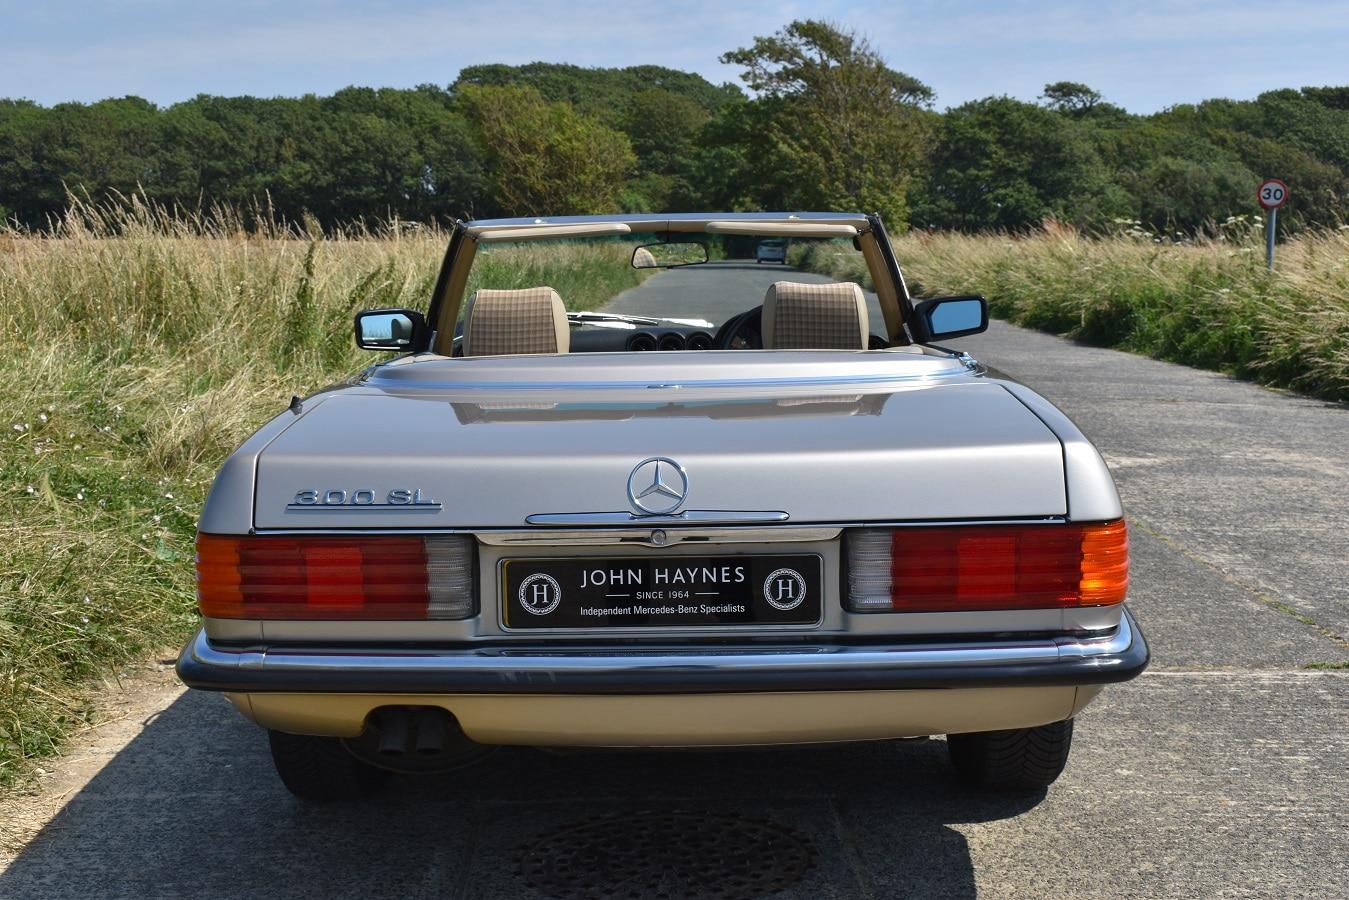 1989 Mercedes-Benz-300SL in Smoke Silver Metallic